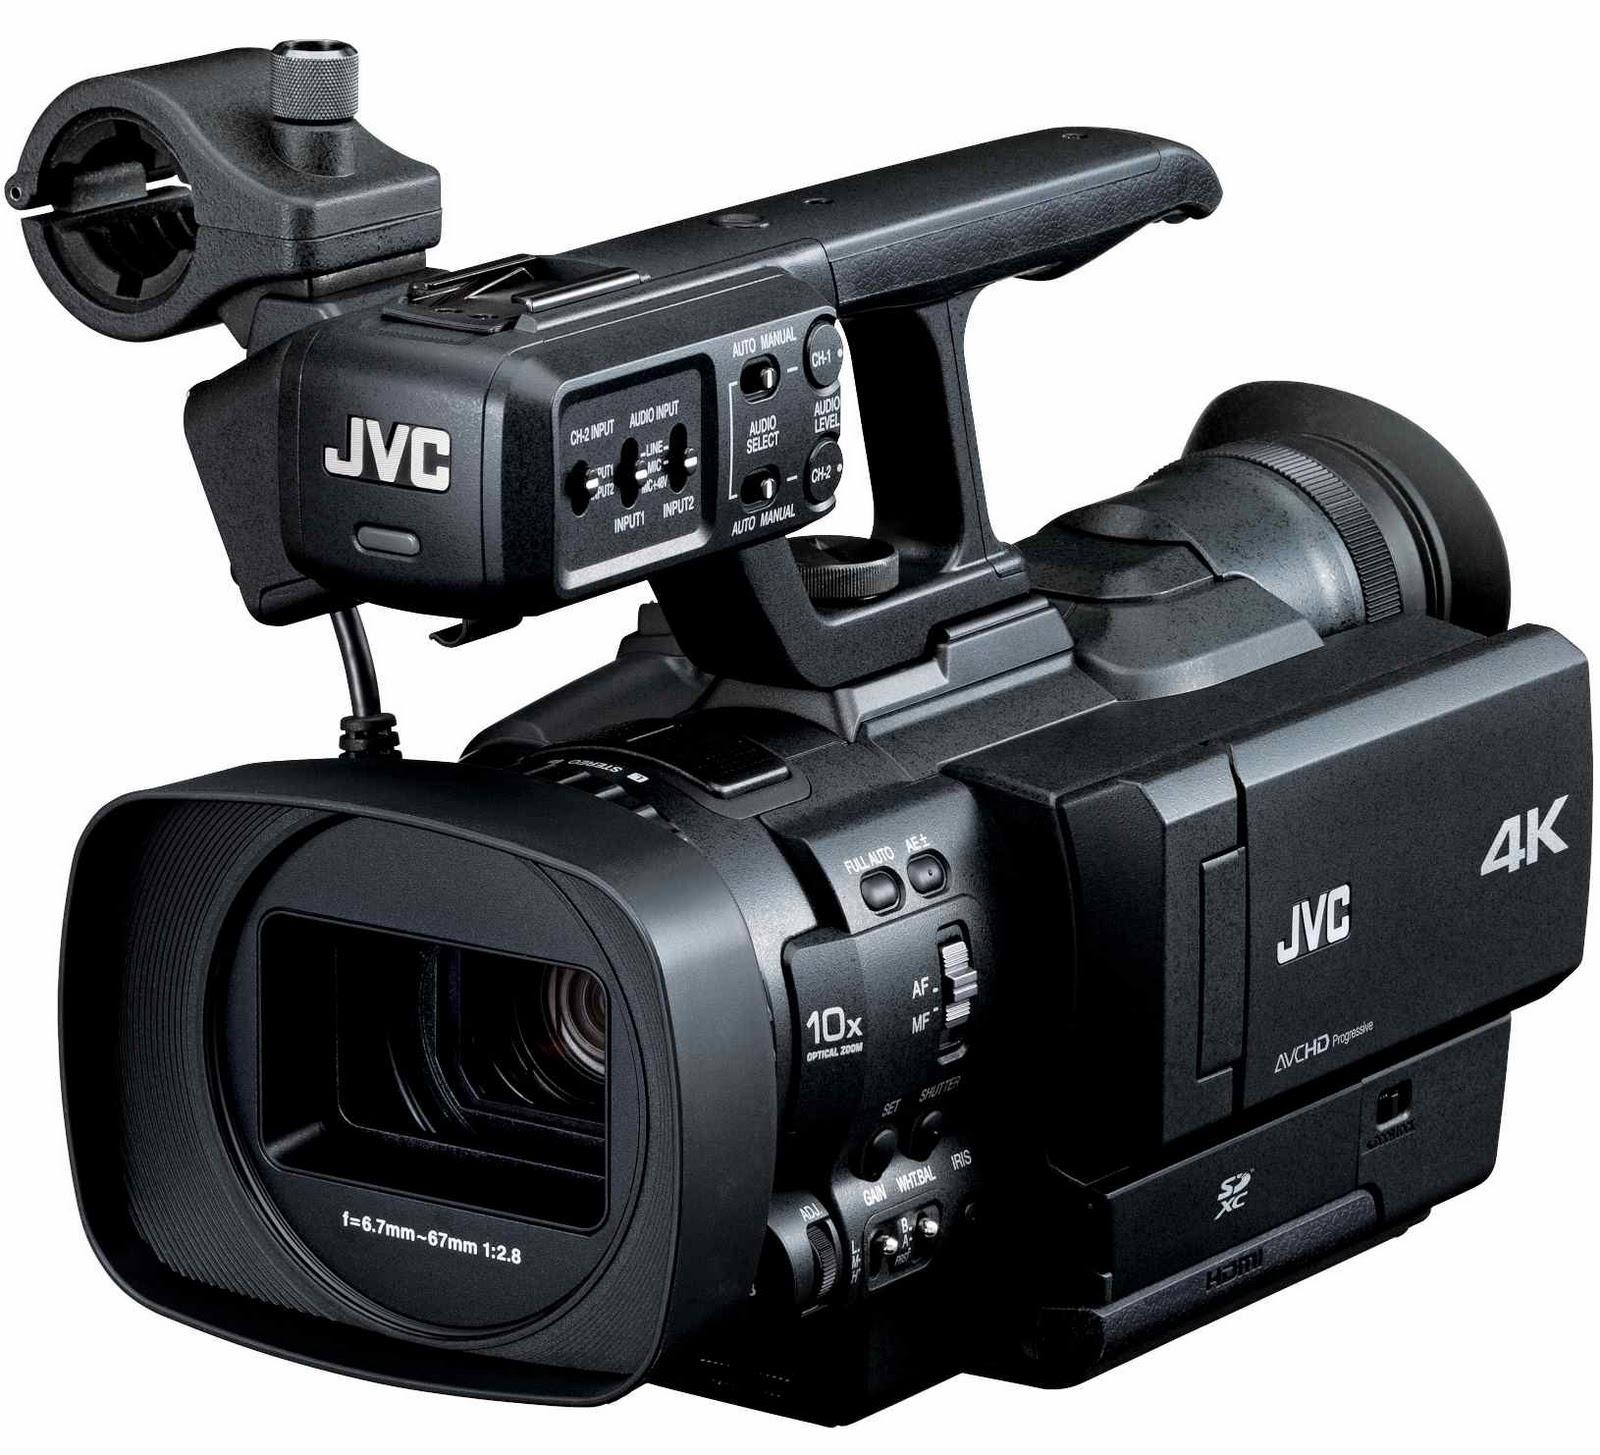 videocamara baratas: